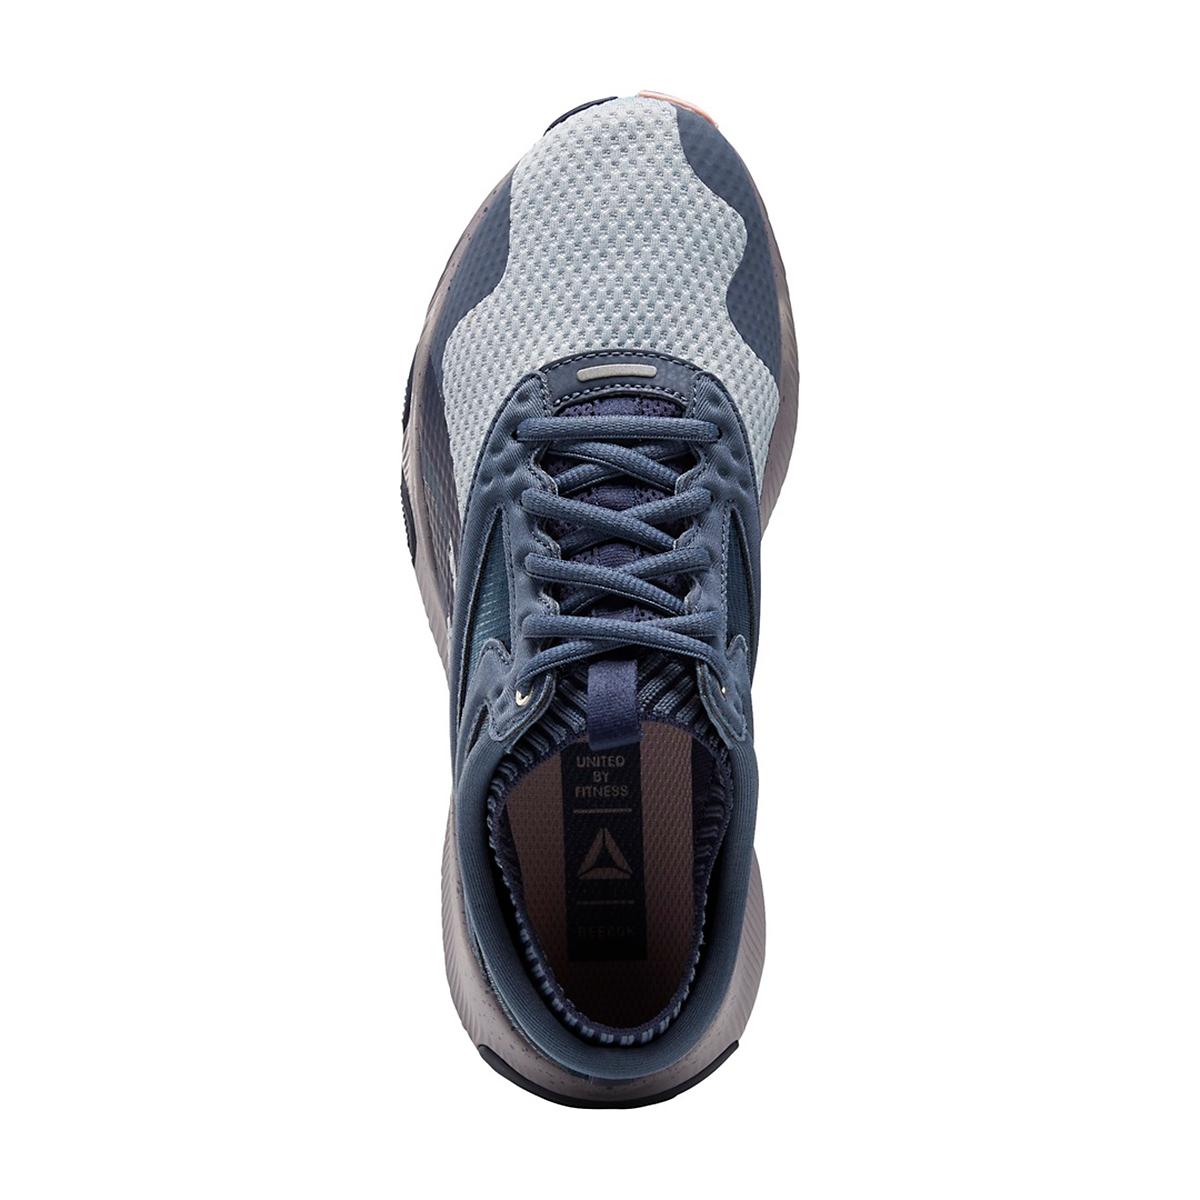 Women's Reebok HIIT Training Shoe - Color: Smoky Indigo/Meteor Grey/White - Size: 5 - Width: Regular, Smoky Indigo/Meteor Grey/White, large, image 3